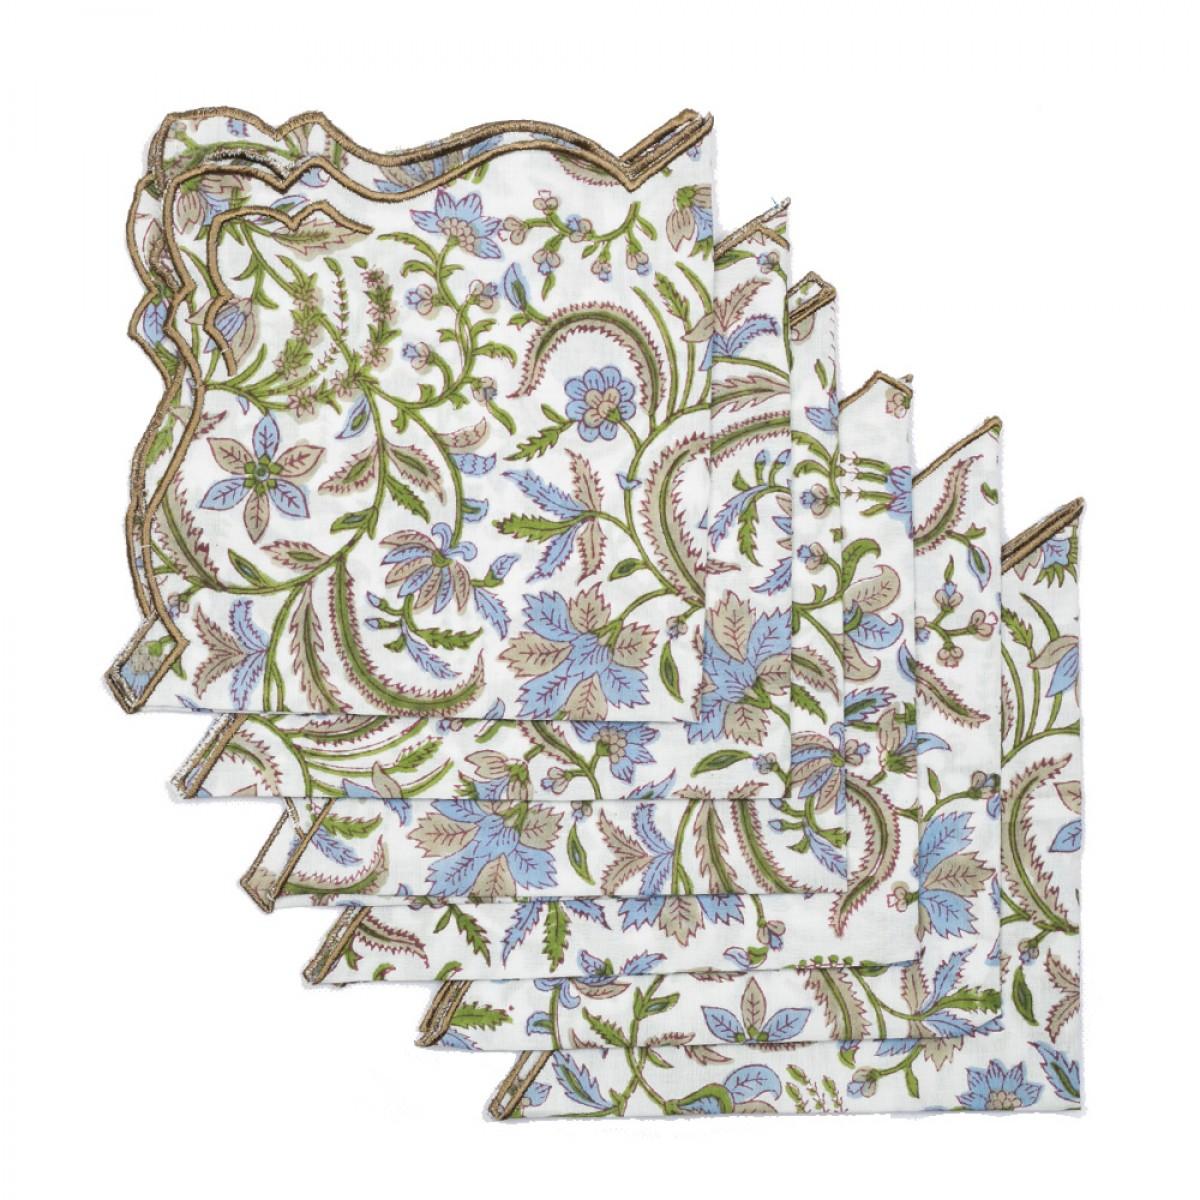 Cotton Scallop Embroidered Printed Napkin - White (Set of 6)